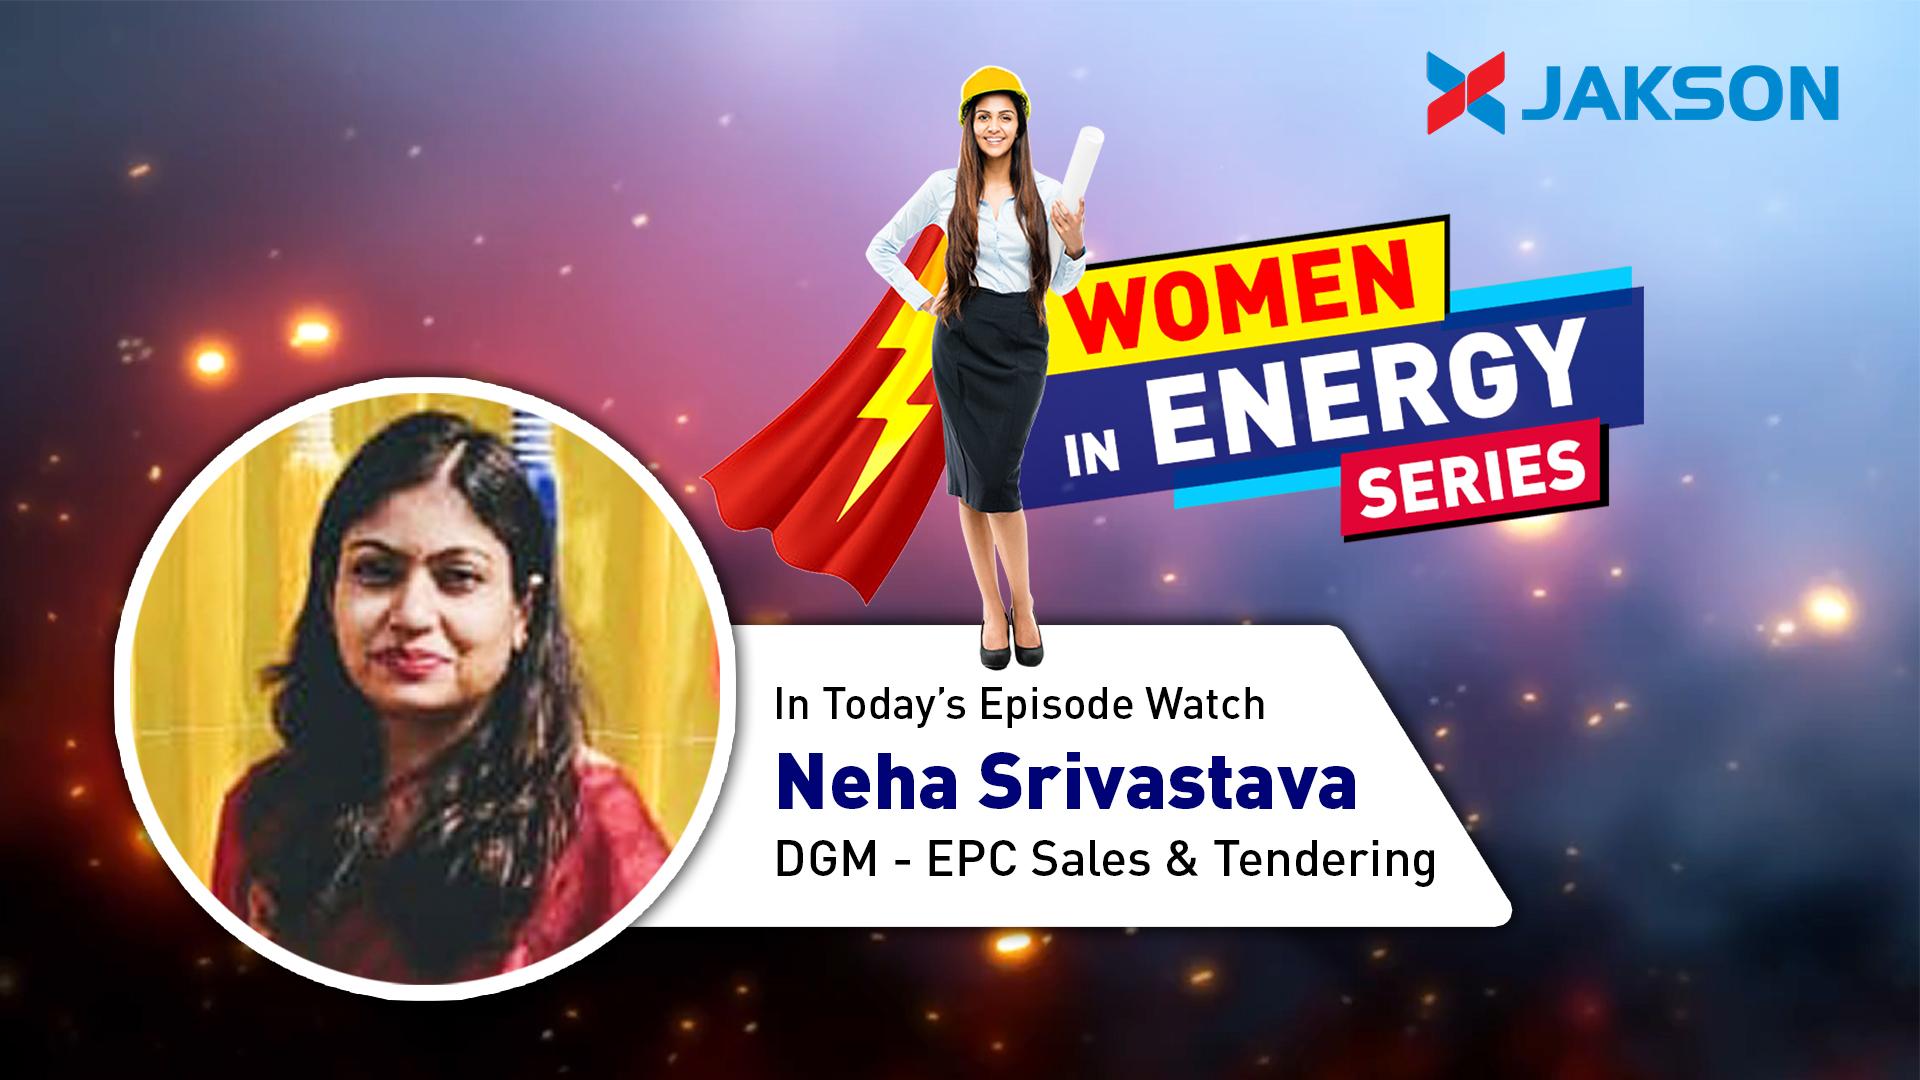 Women in Energy - Episode 3 - Watch Ms. Neha Srivastava, DGM - EPC Sales & Tendering